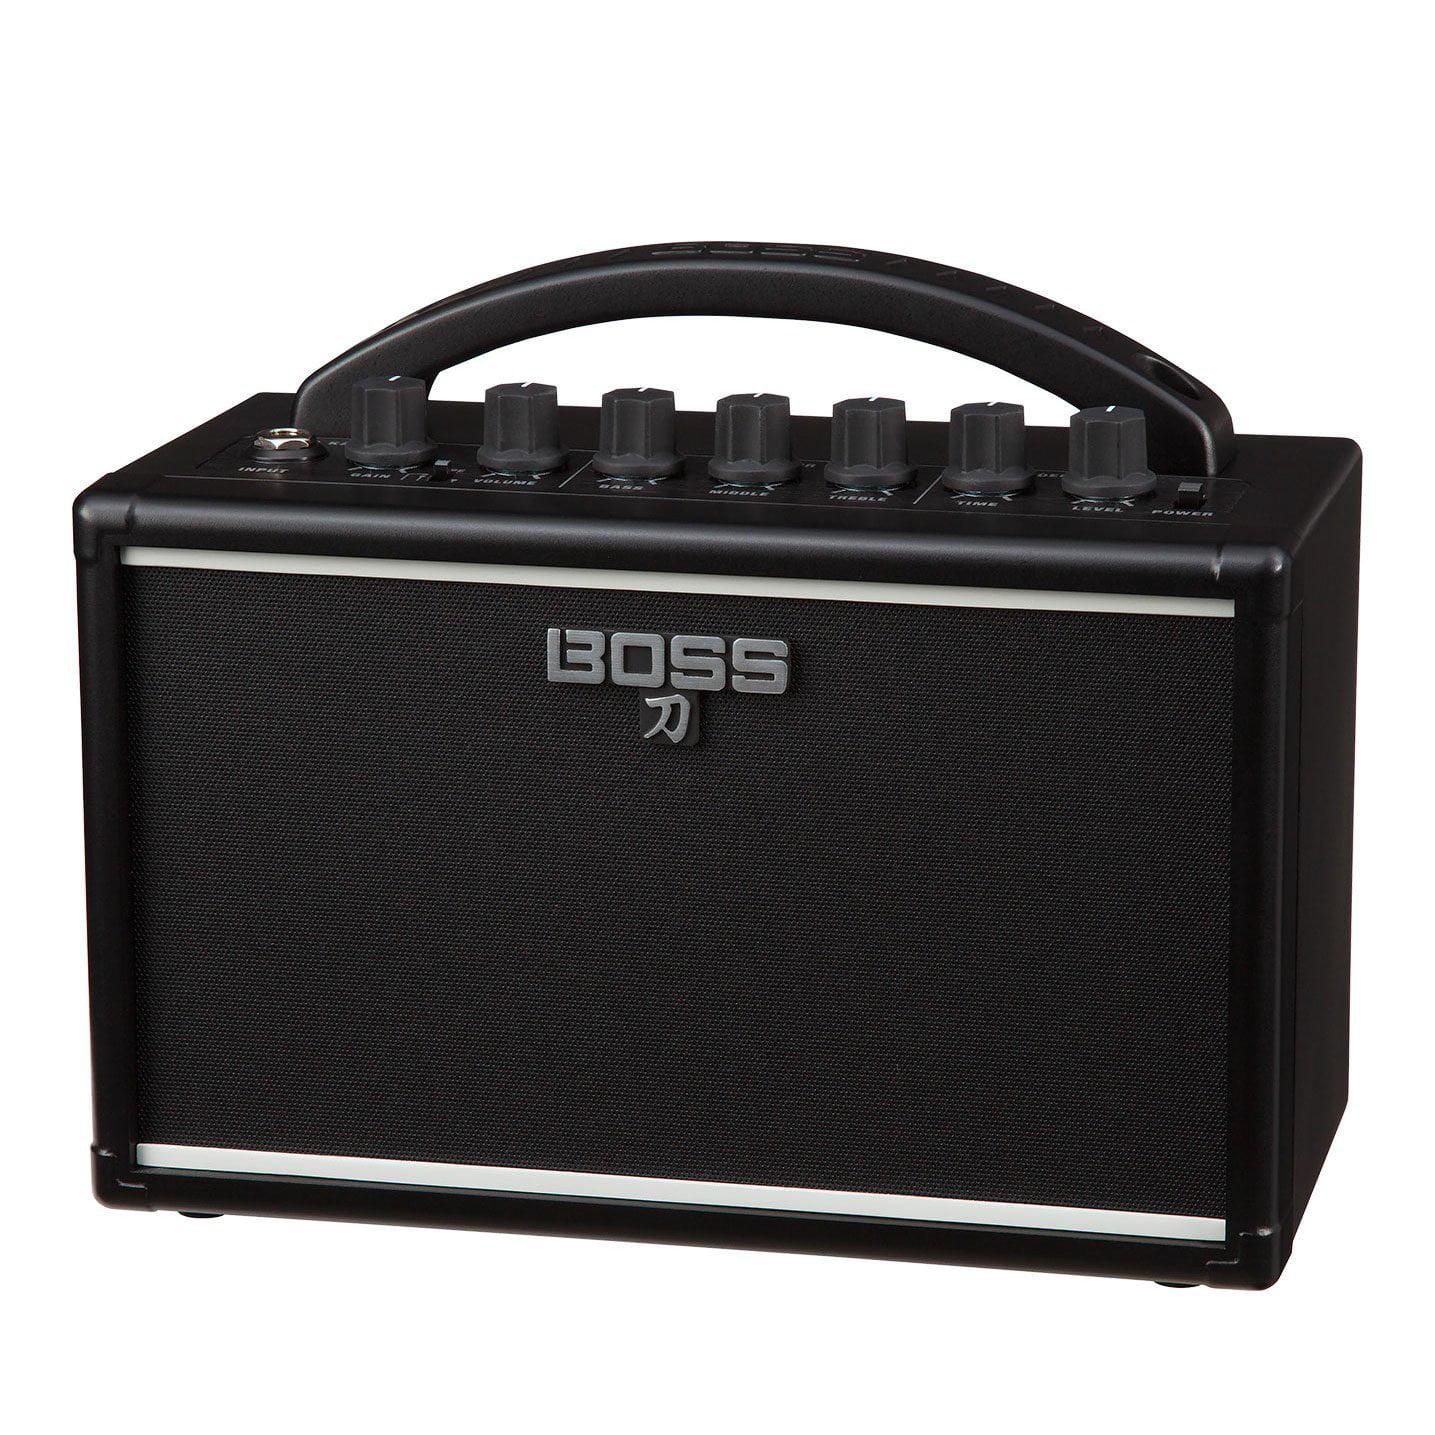 Boss KATANA-MINI Lightweight Portable Personal Guitar Monitor Amp Amplifier